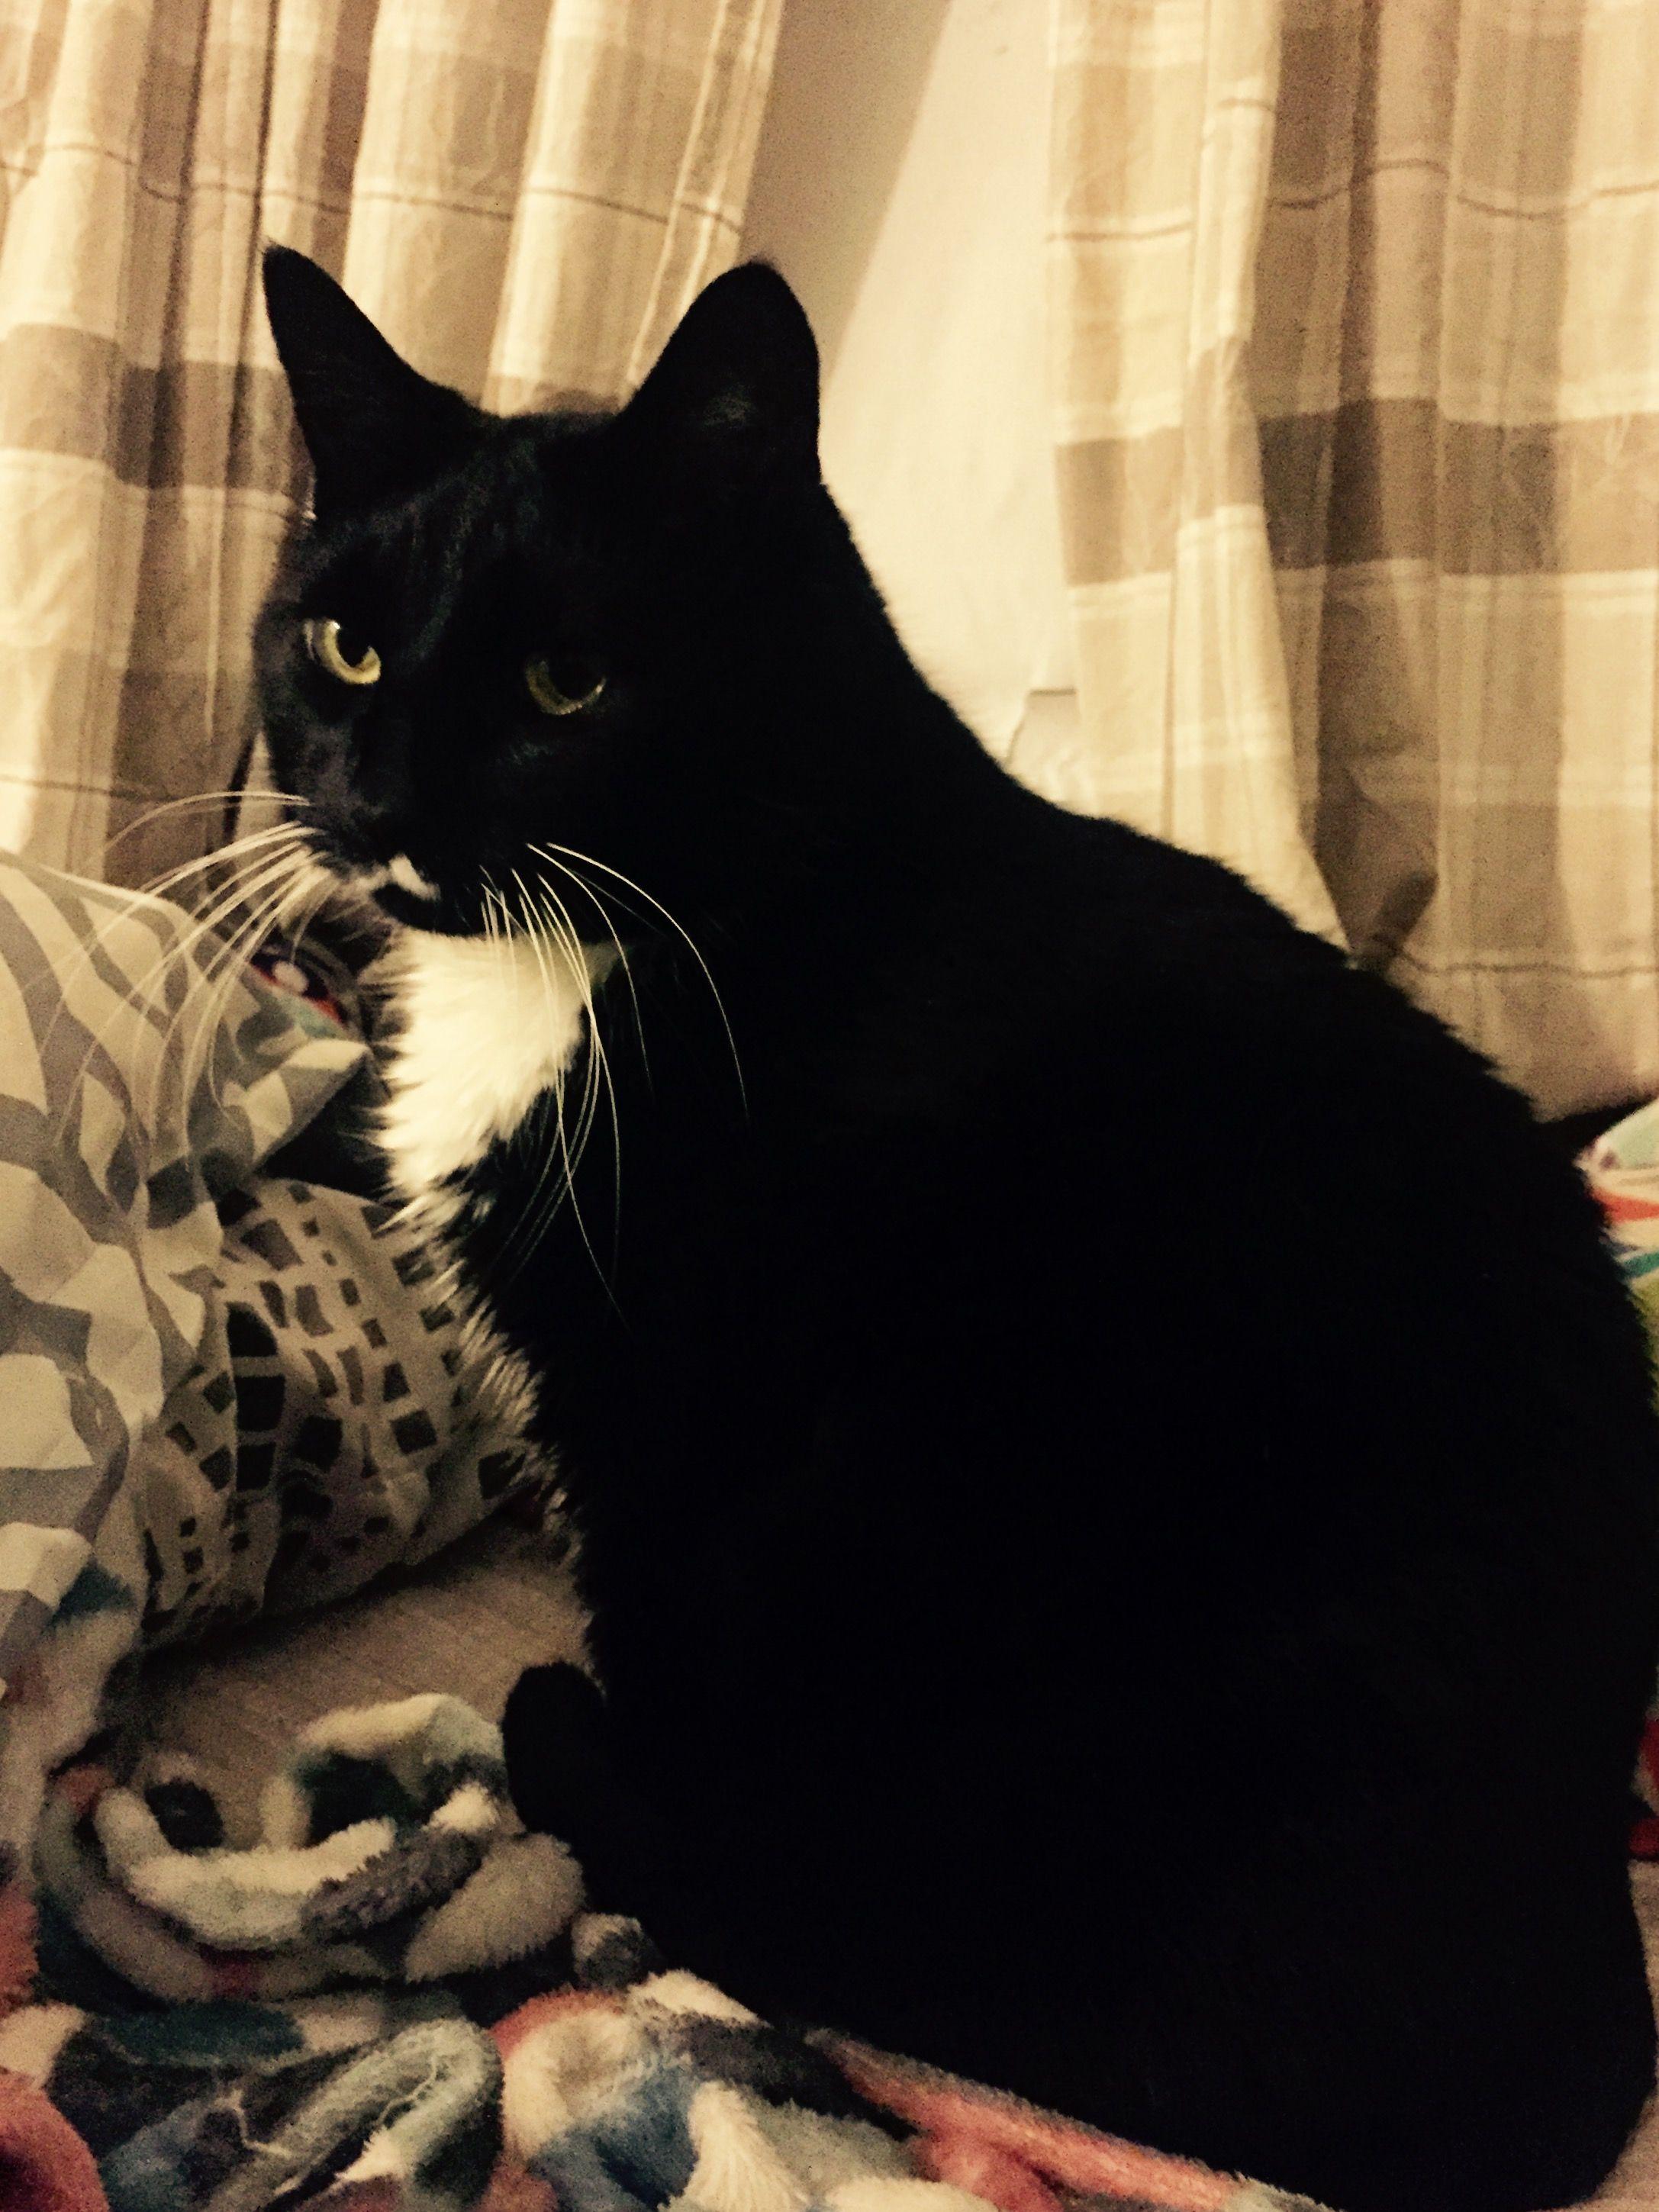 This is my cat Frodo http://ift.tt/2fXv2F2